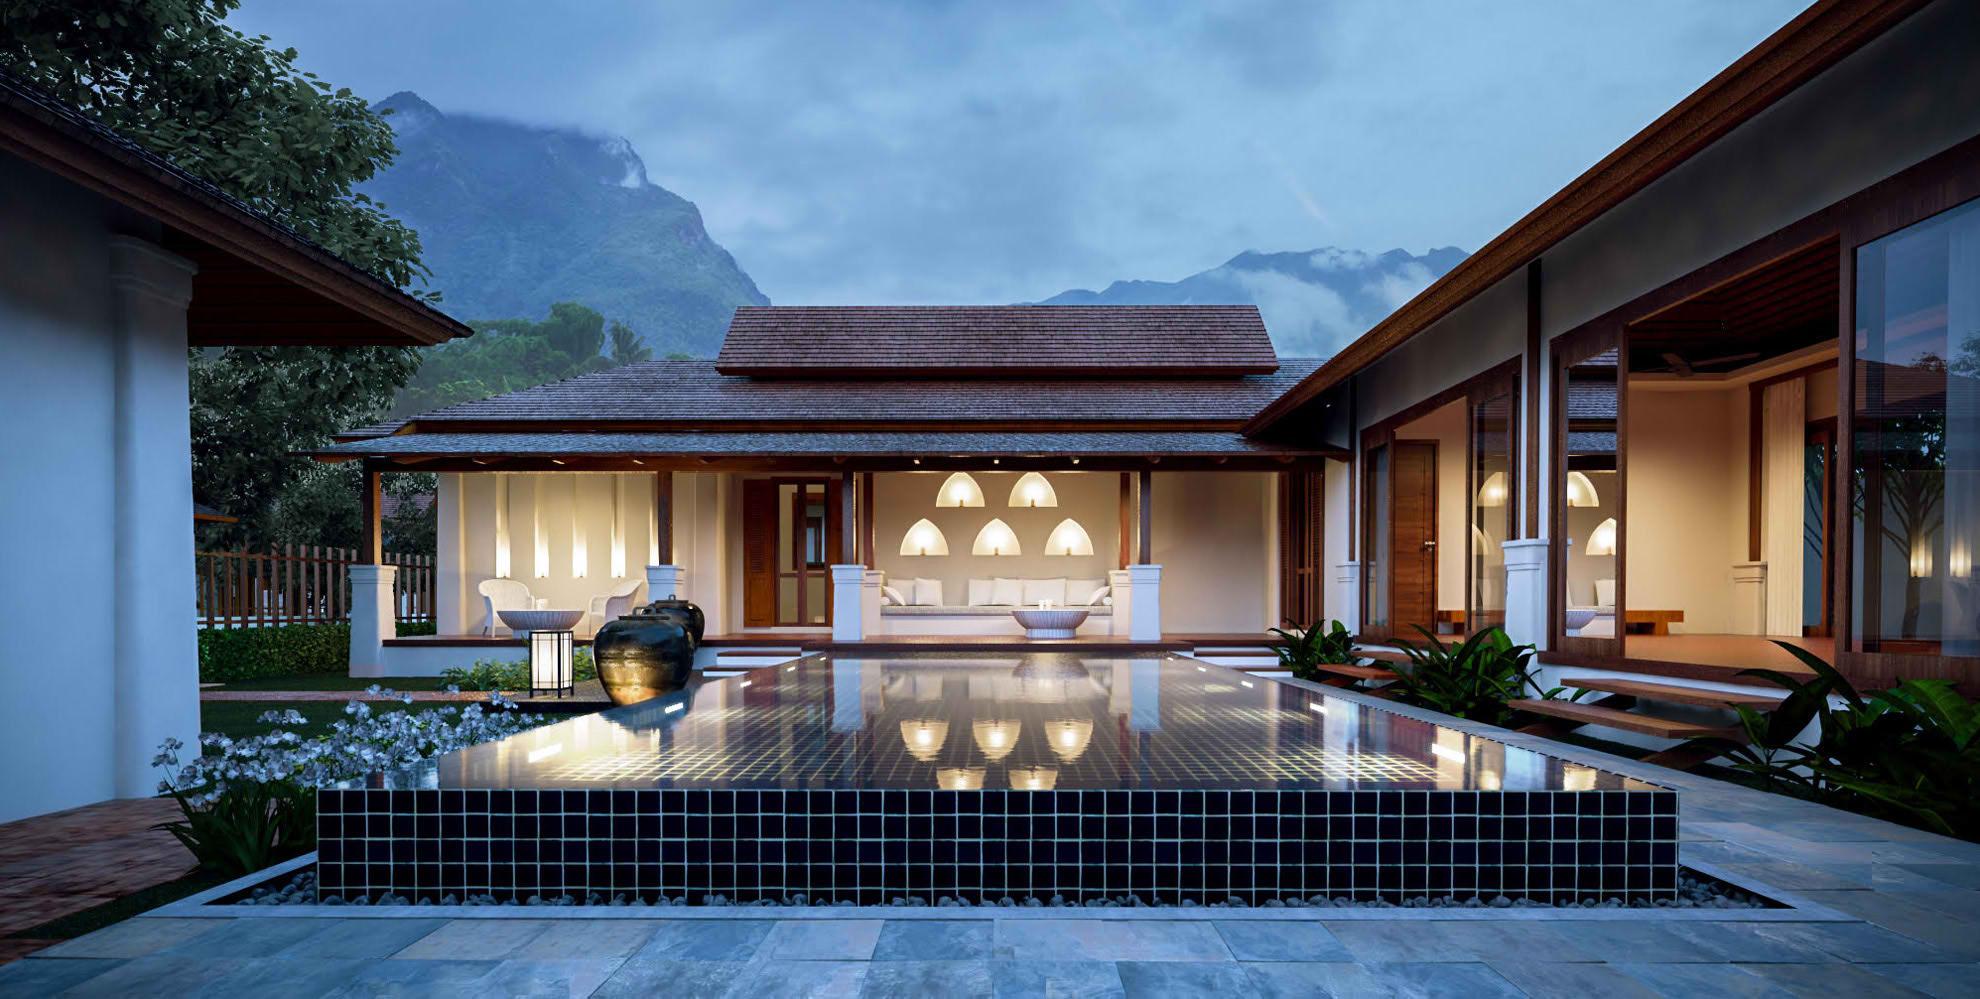 Chiang Mai hotels Azalea Village